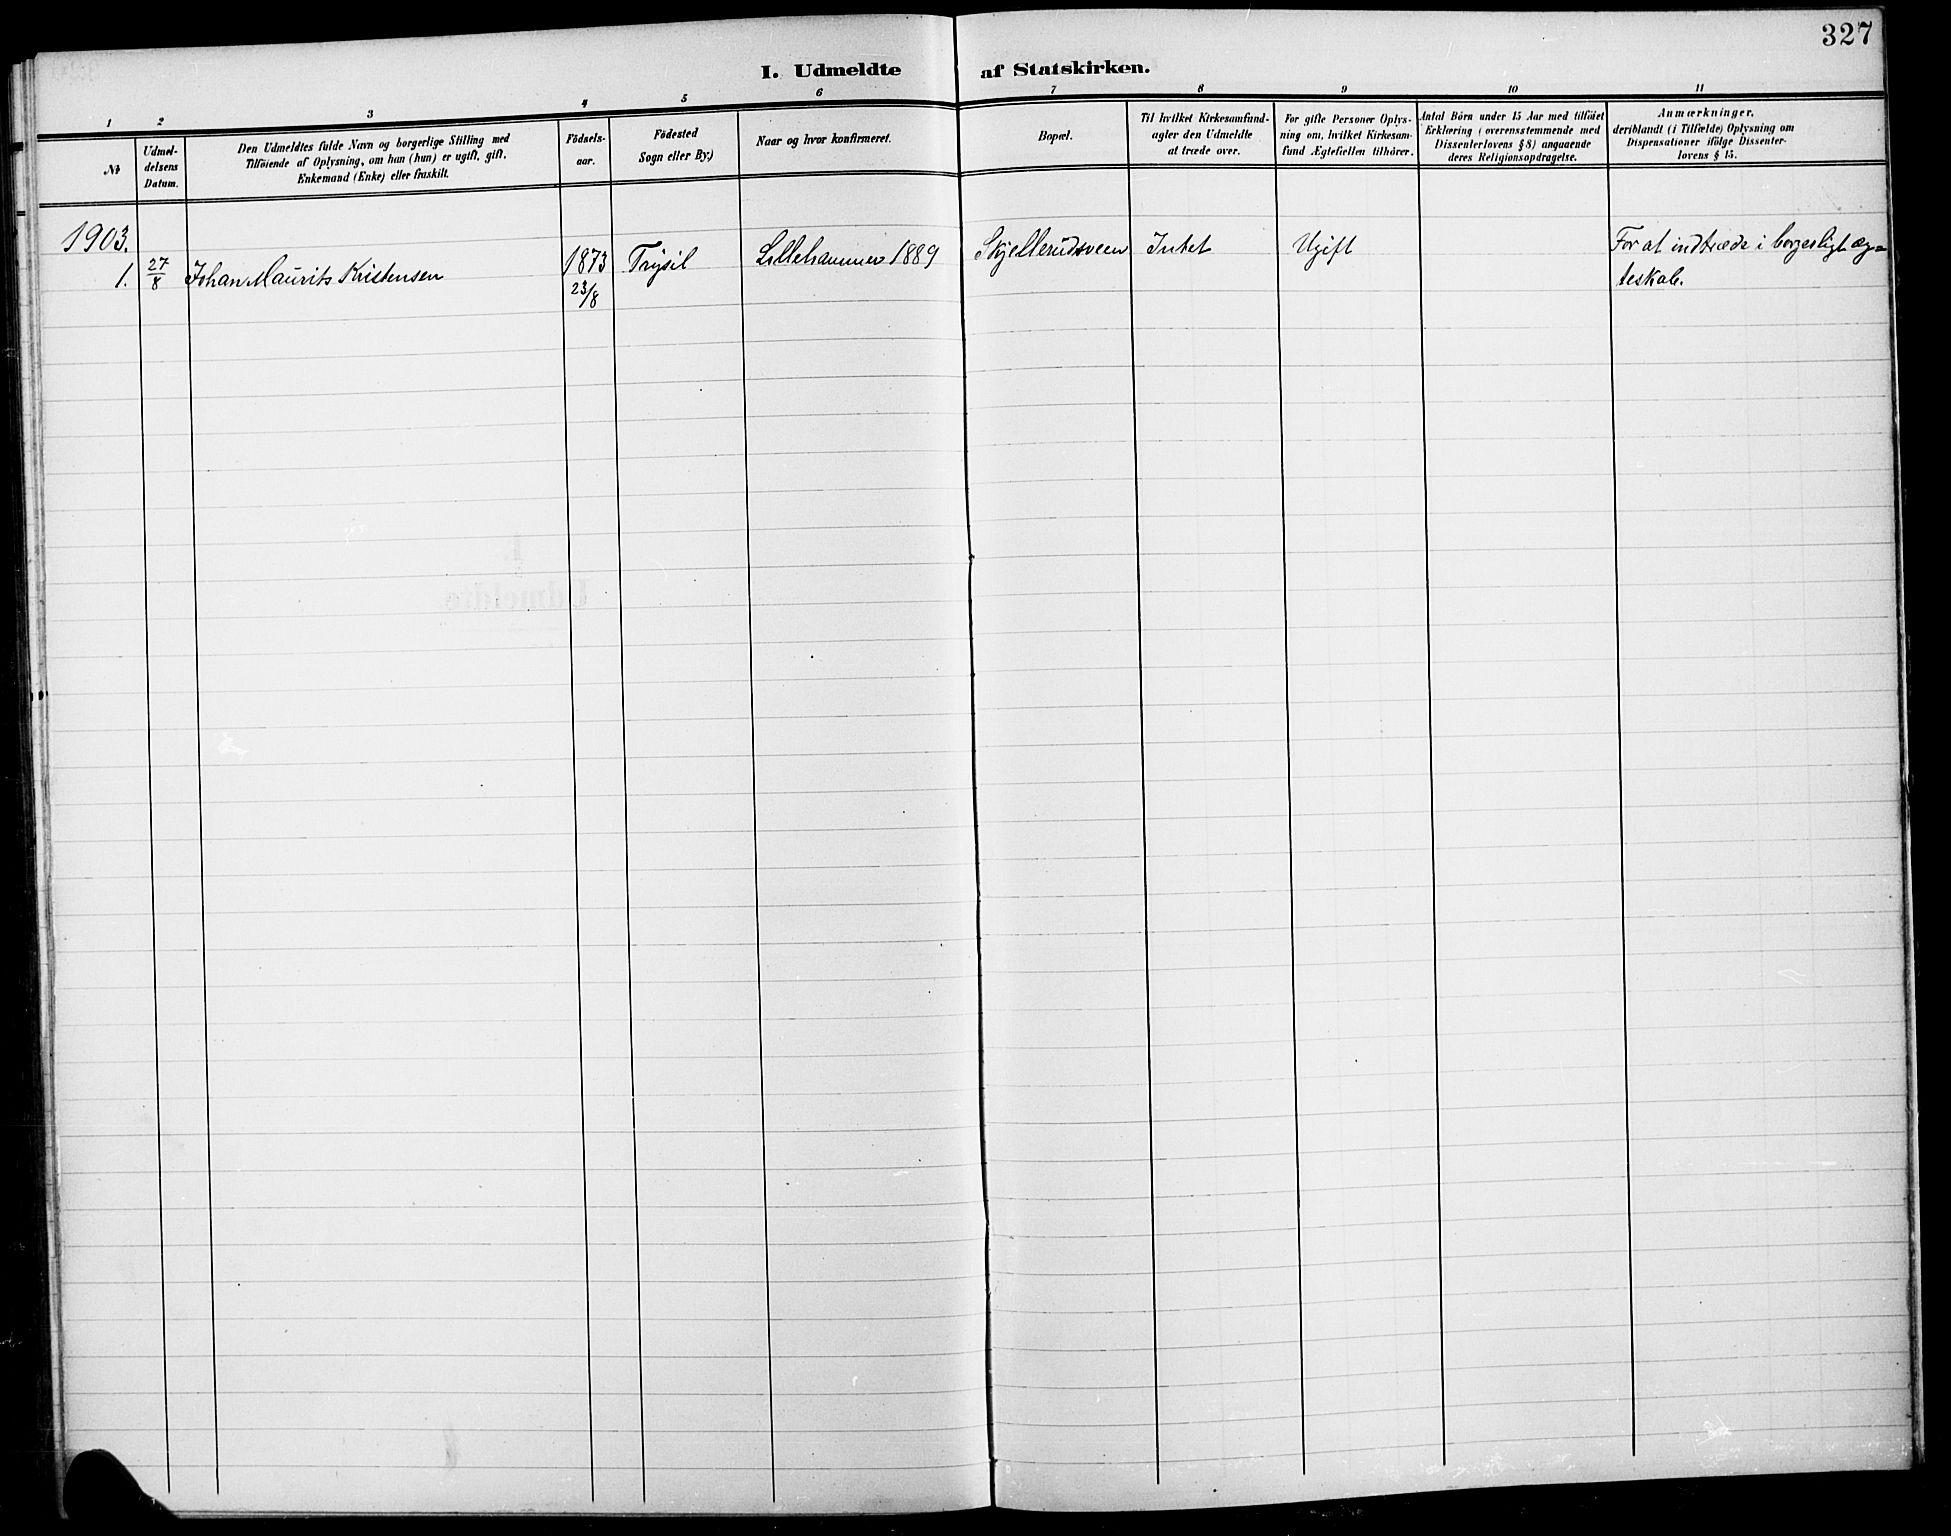 SAH, Fåberg prestekontor, H/Ha/Hab/L0012: Klokkerbok nr. 12, 1903-1924, s. 327